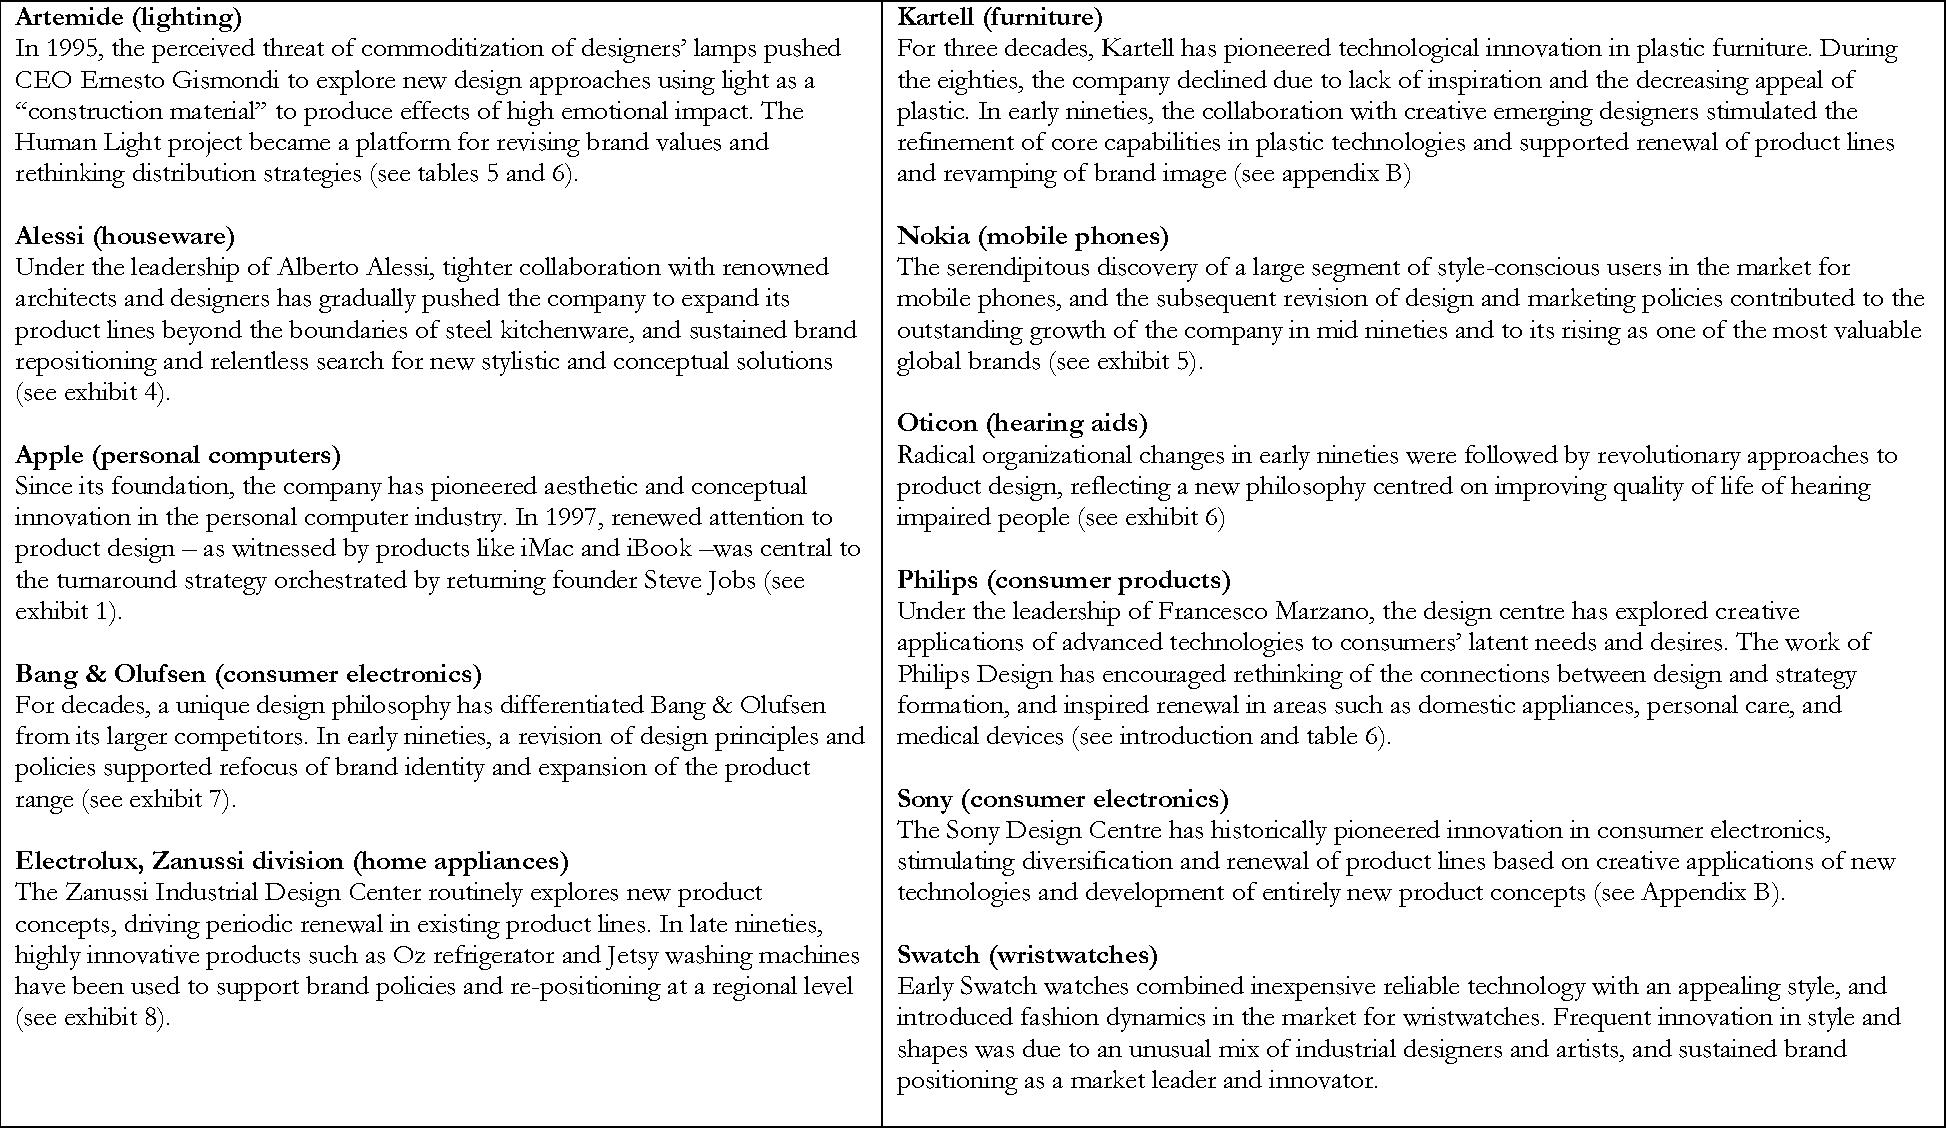 managing design and designers for strategic renewal semantic scholar